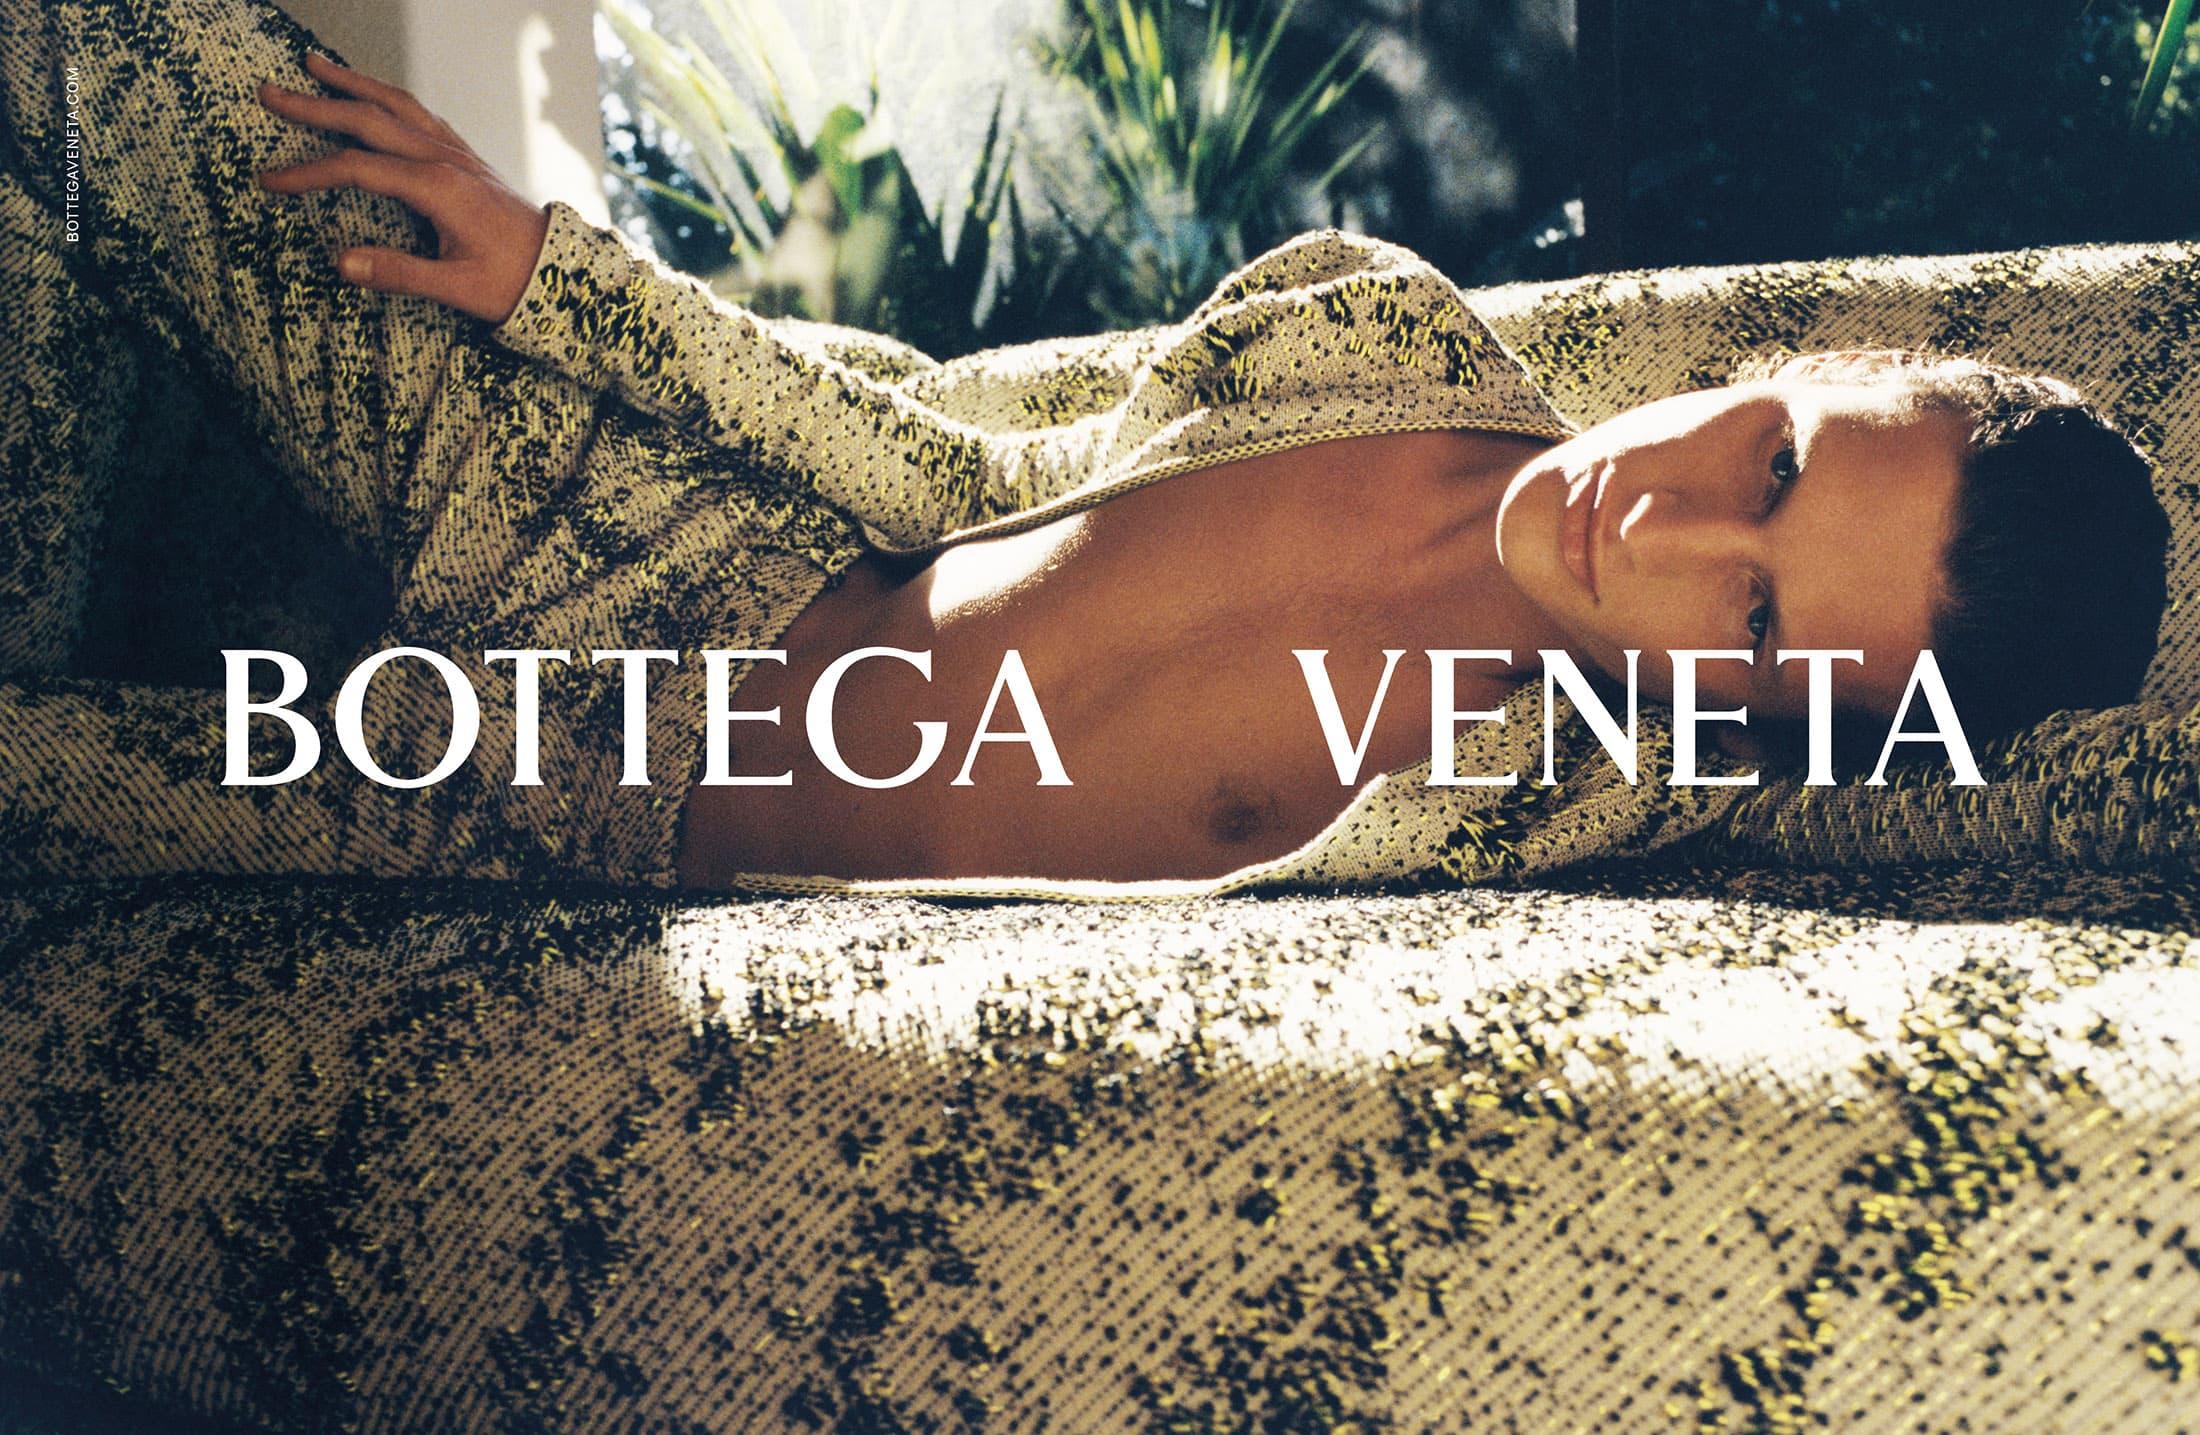 Bottega Veneta Spring 2021 Ad Campaign